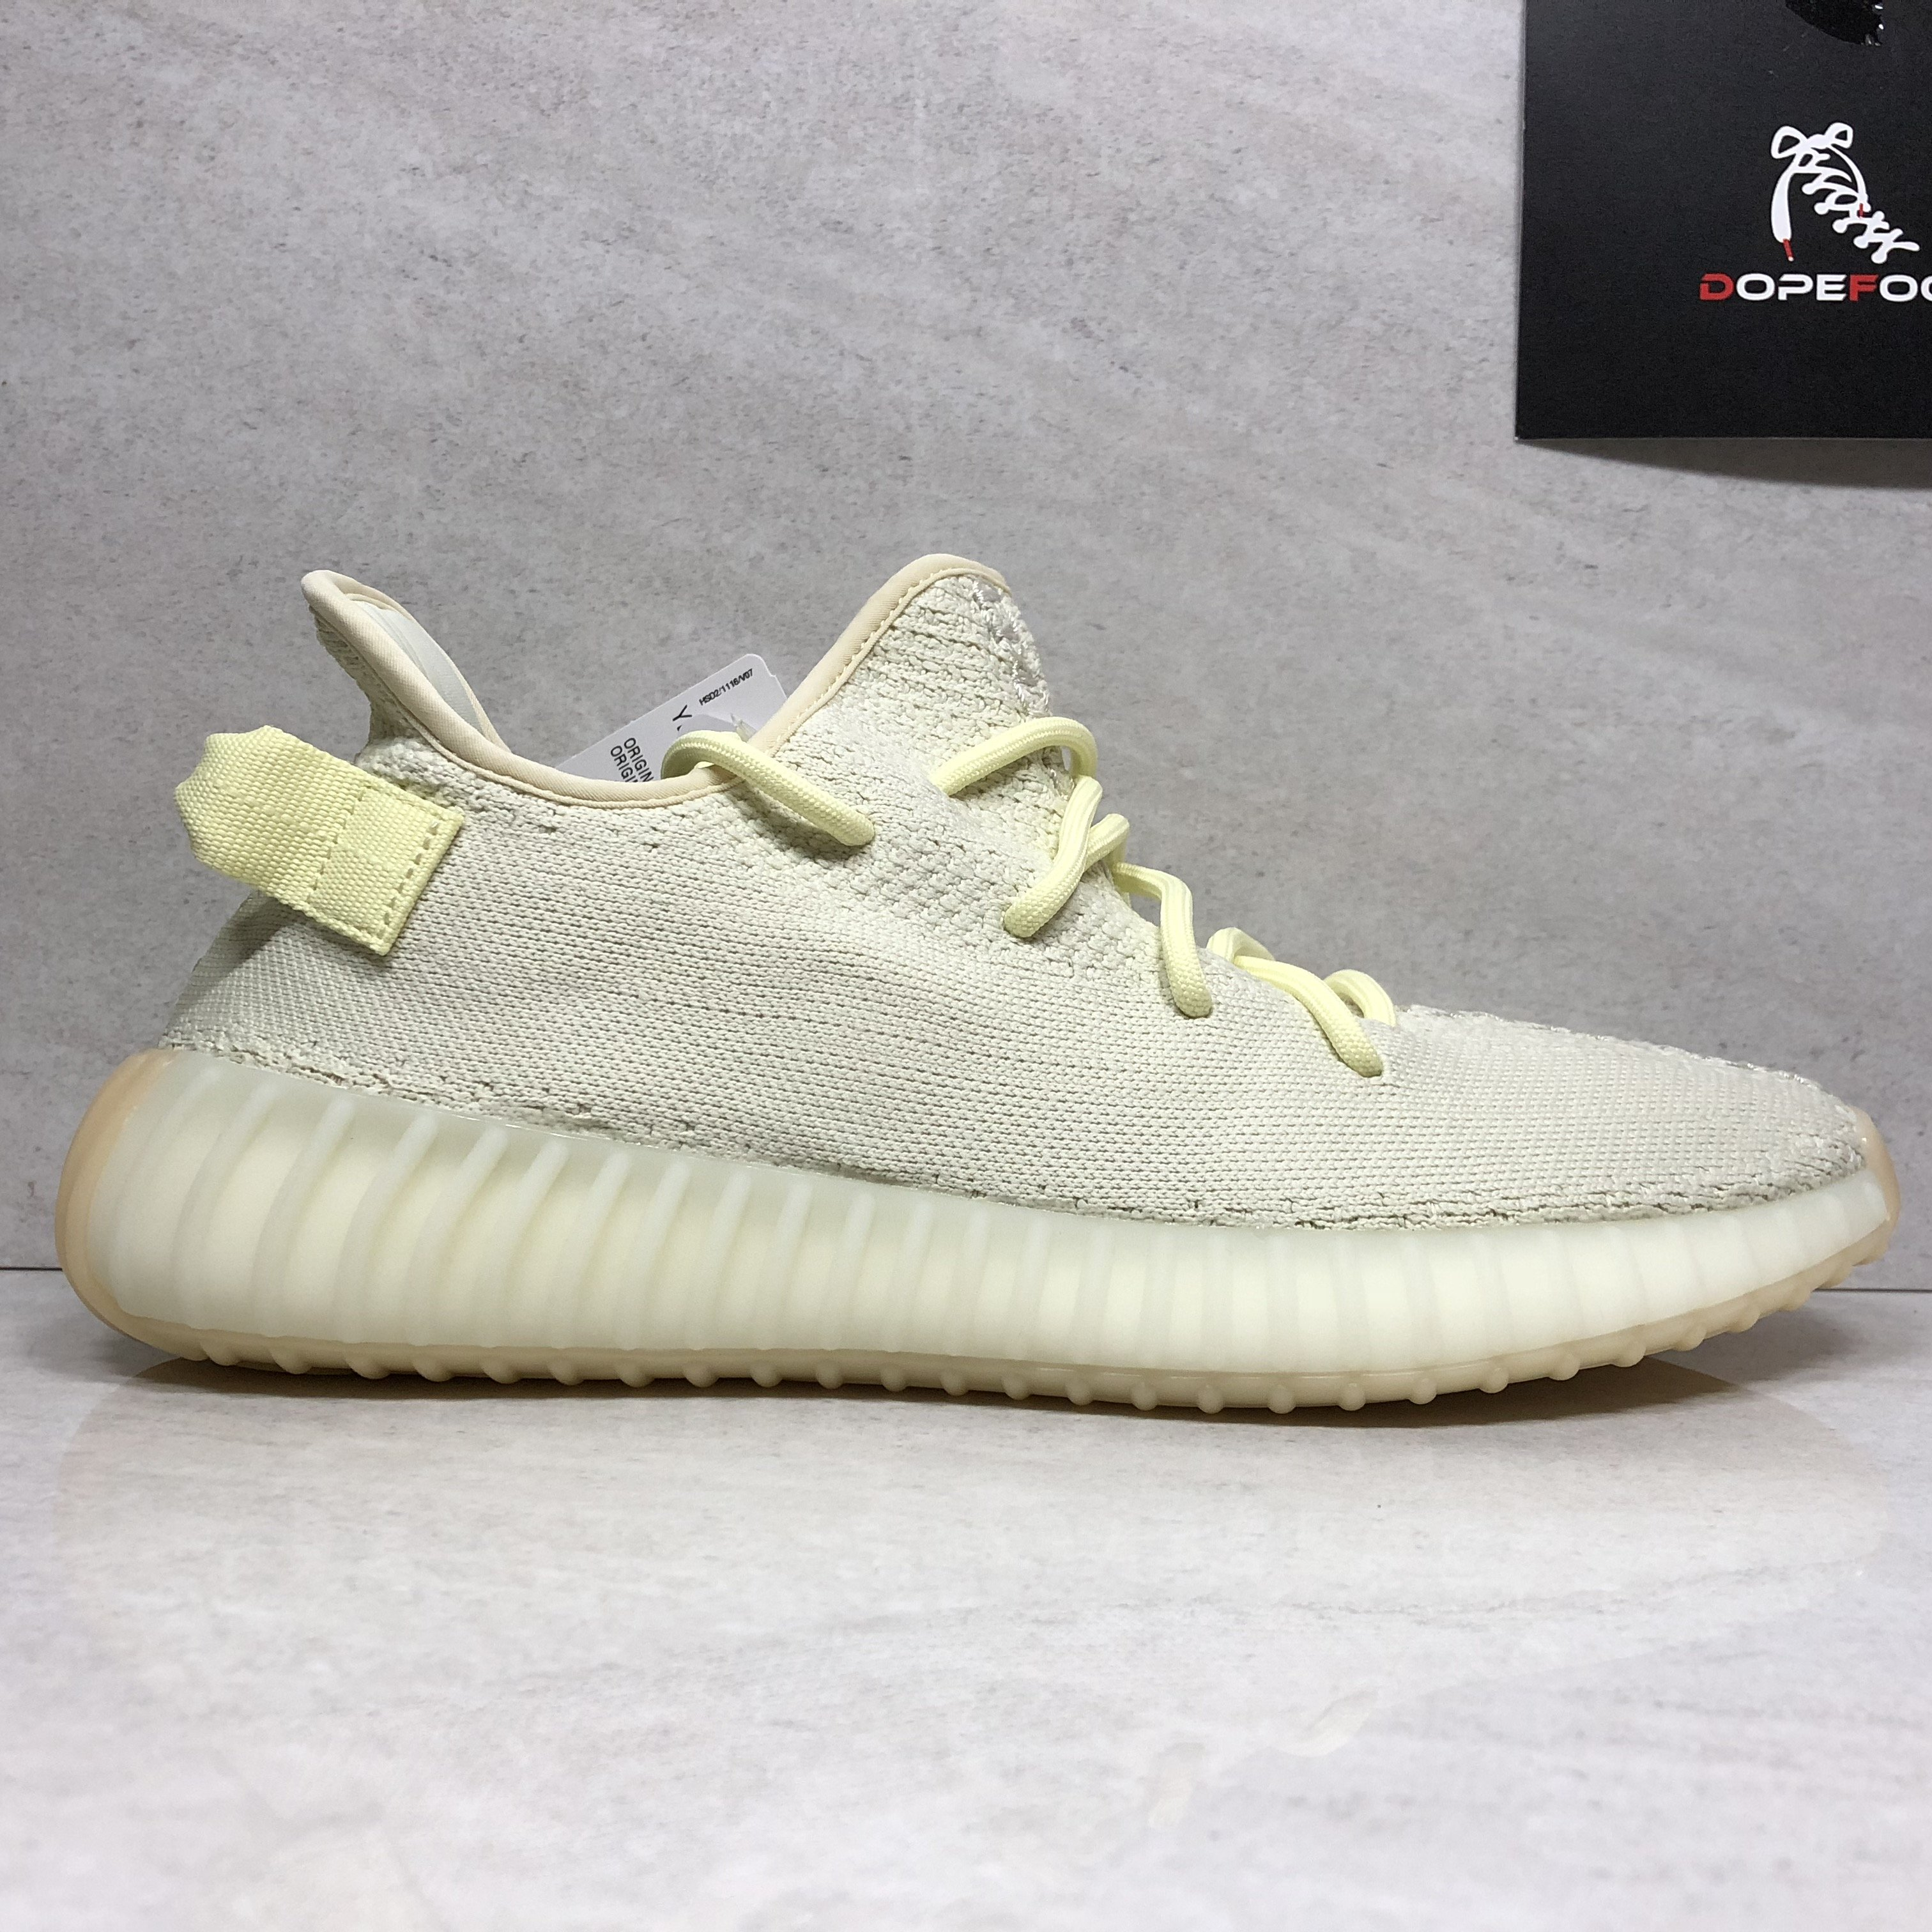 86f4386e4b3b0 Adidas Yeezy Boost 350 V2 Butter F36980 Men s Size 10